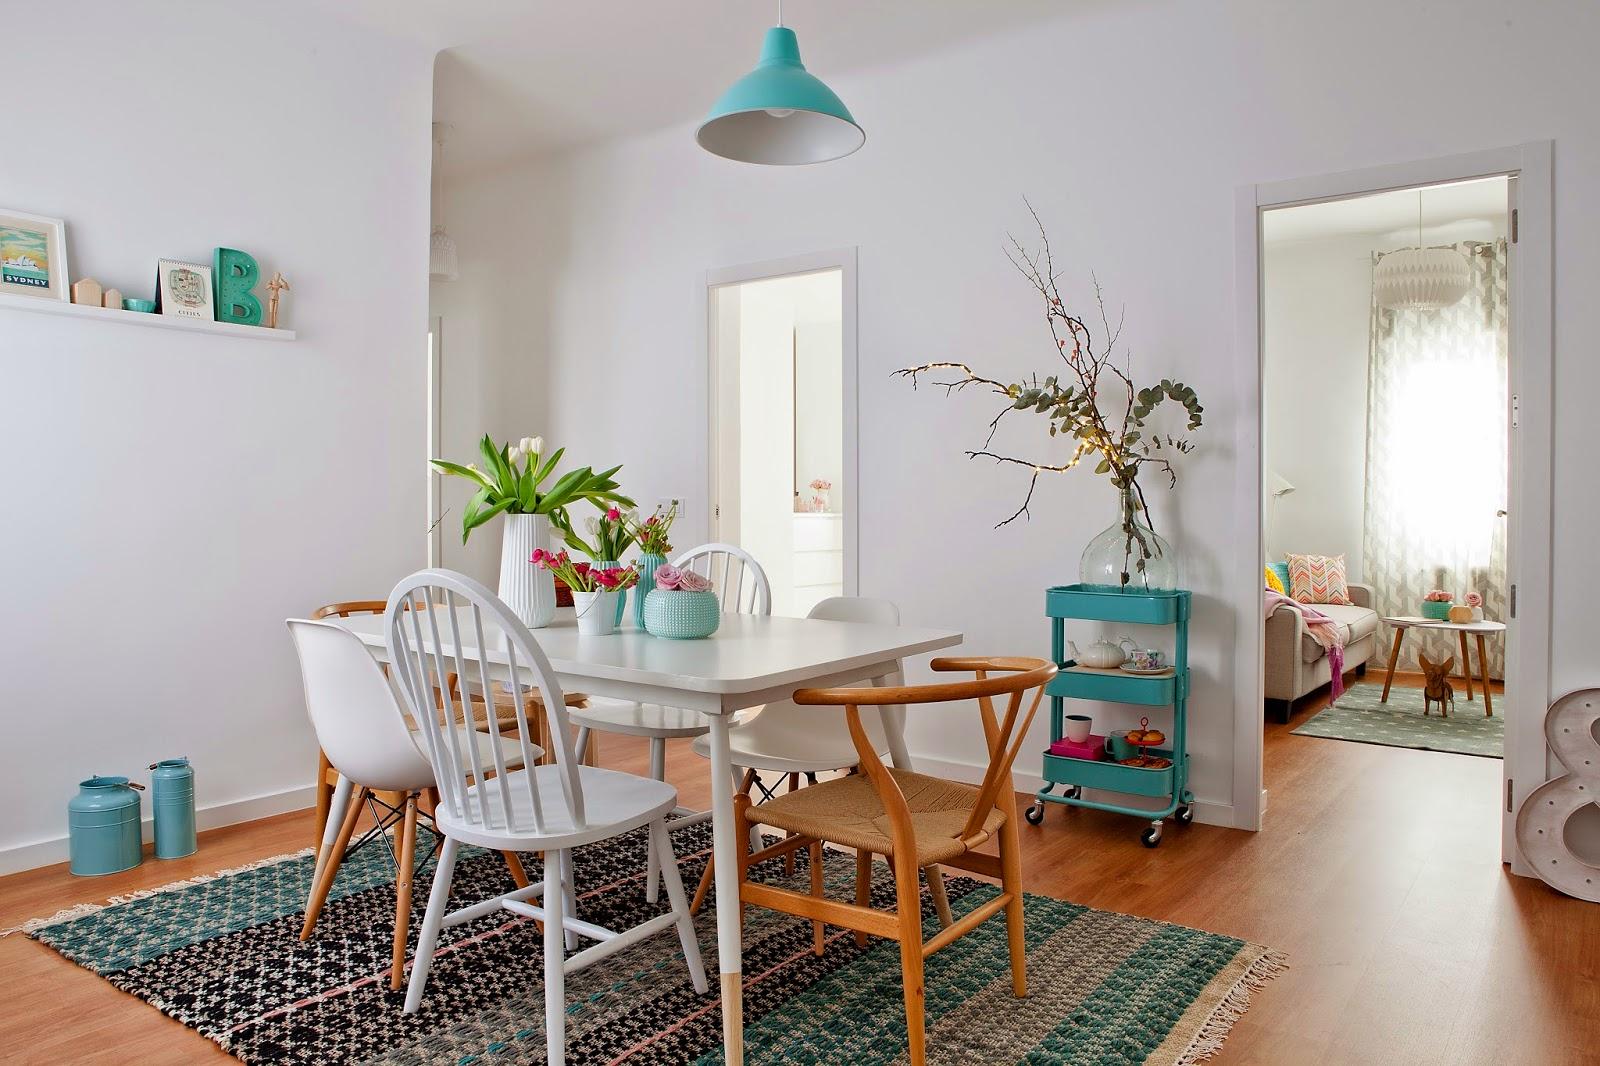 Decoraci n de interiores c mo decorar un piso de for Revistas de decoracion de casas